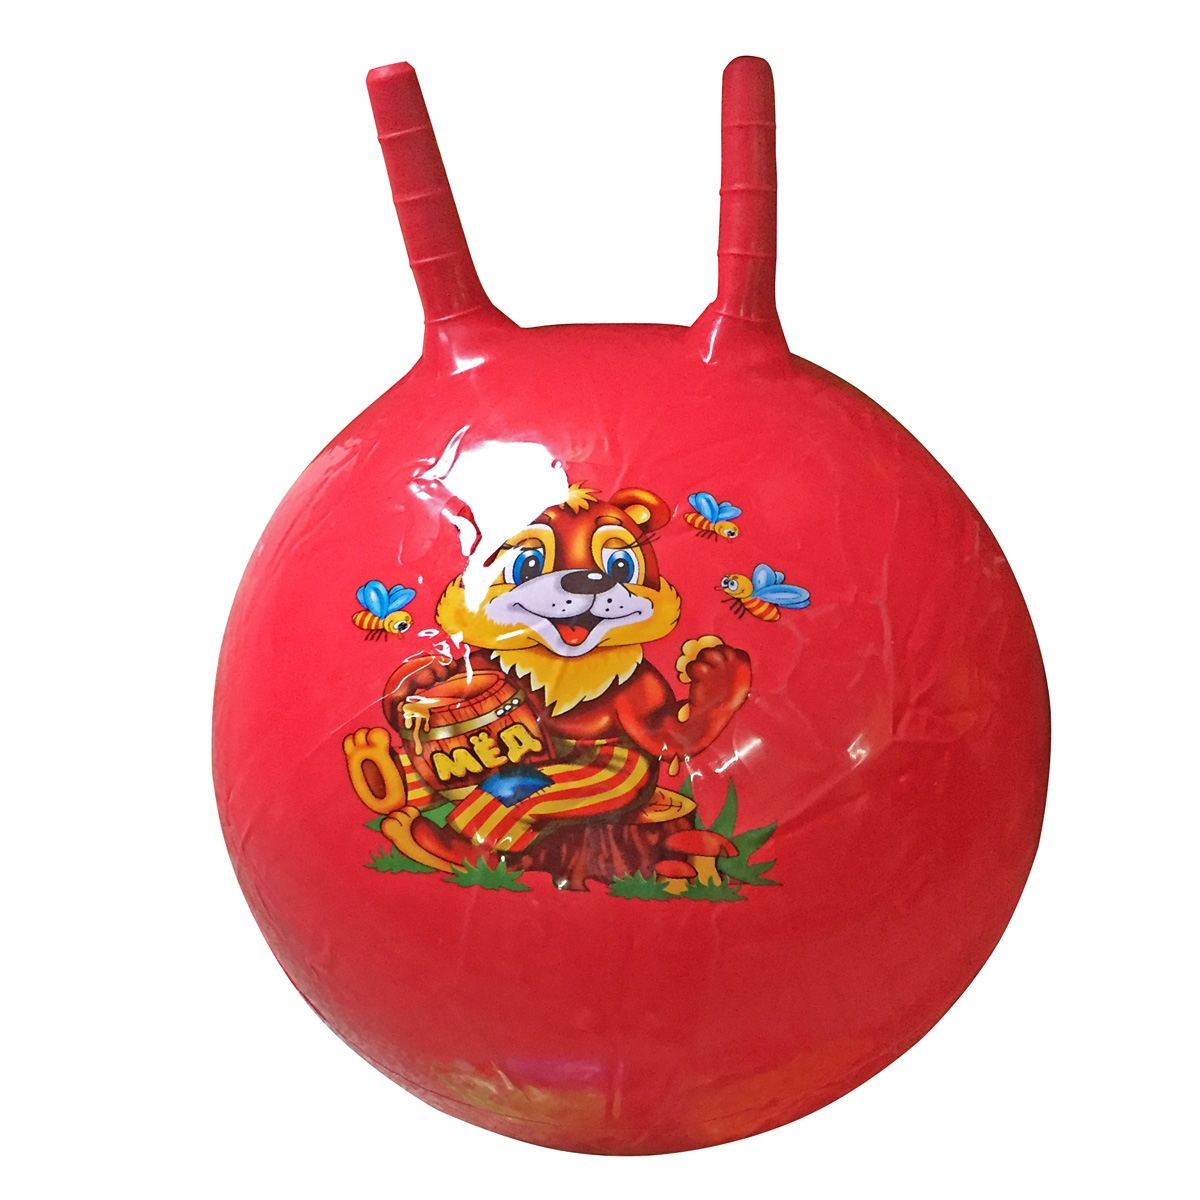 Купить Мячи, 48275, Veld Co, Китай, red